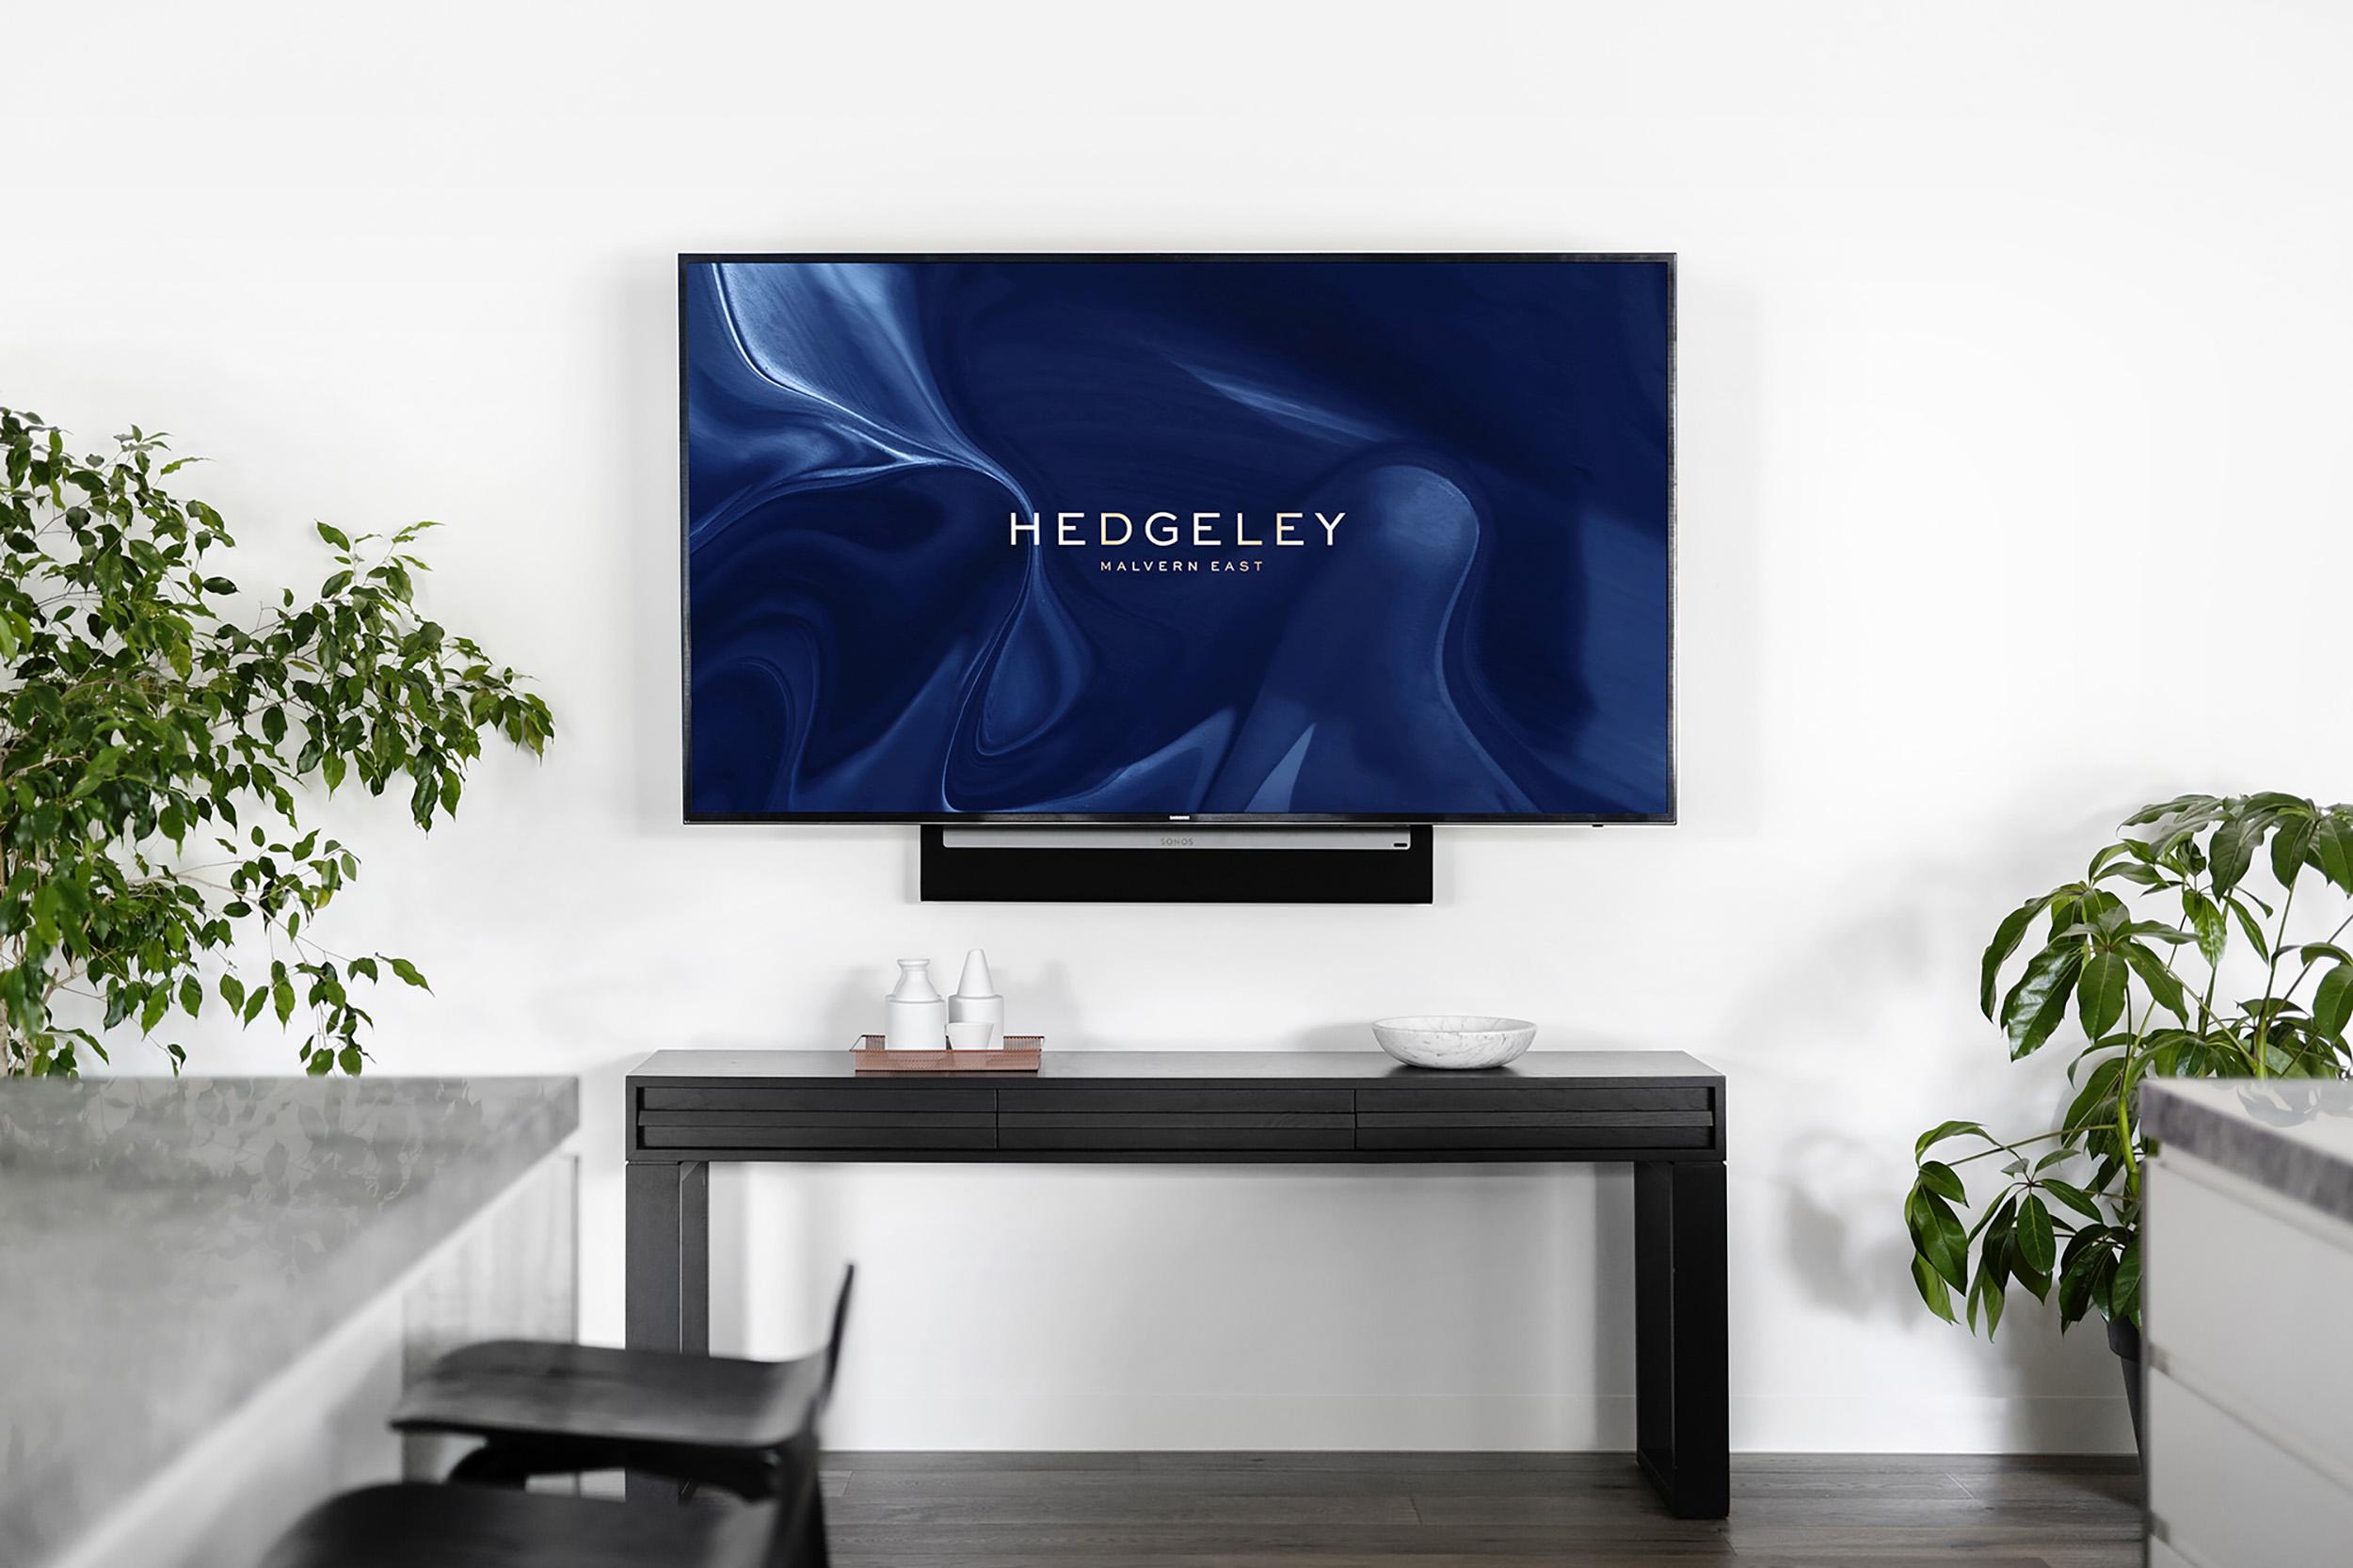 LittleProjects_Hedgeley_Displaysweet_TV2.jpg